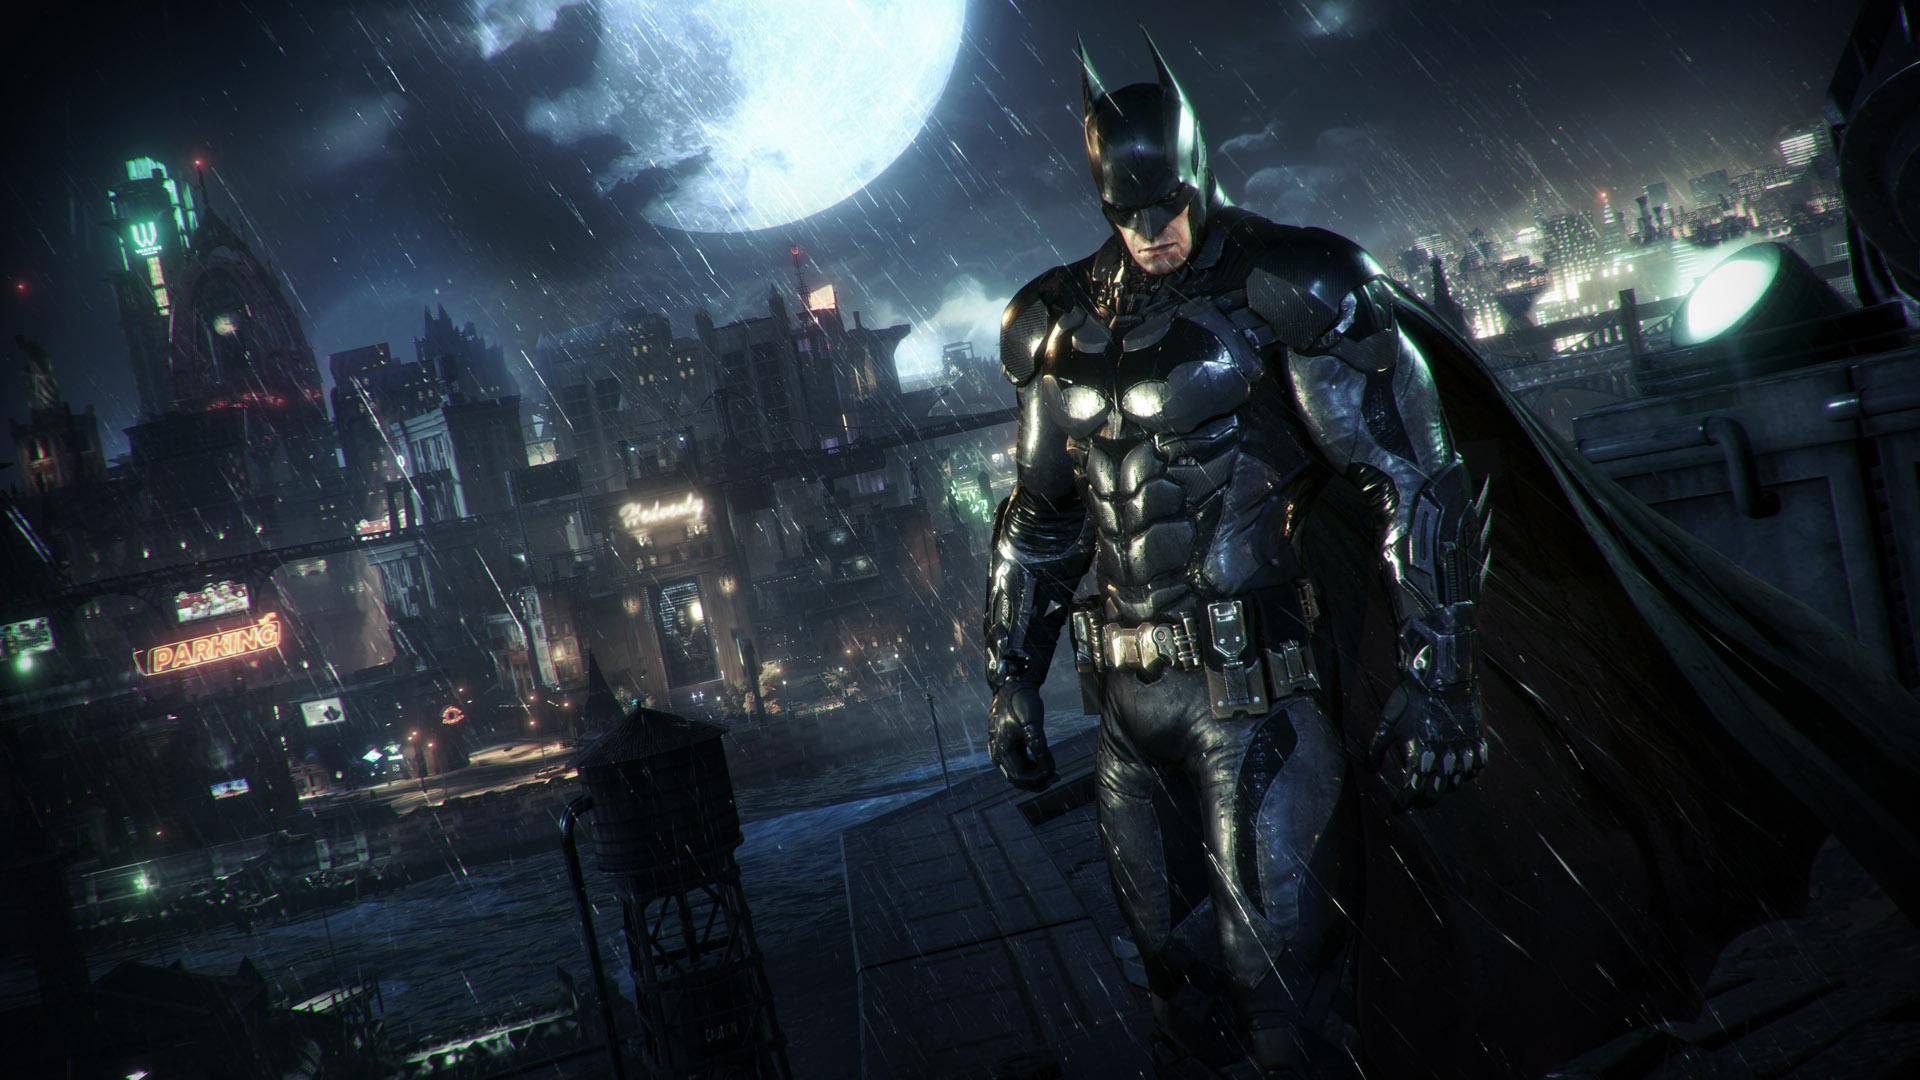 High Resolution Wallpaper | Batman: Arkham Knight 1920x1080 px